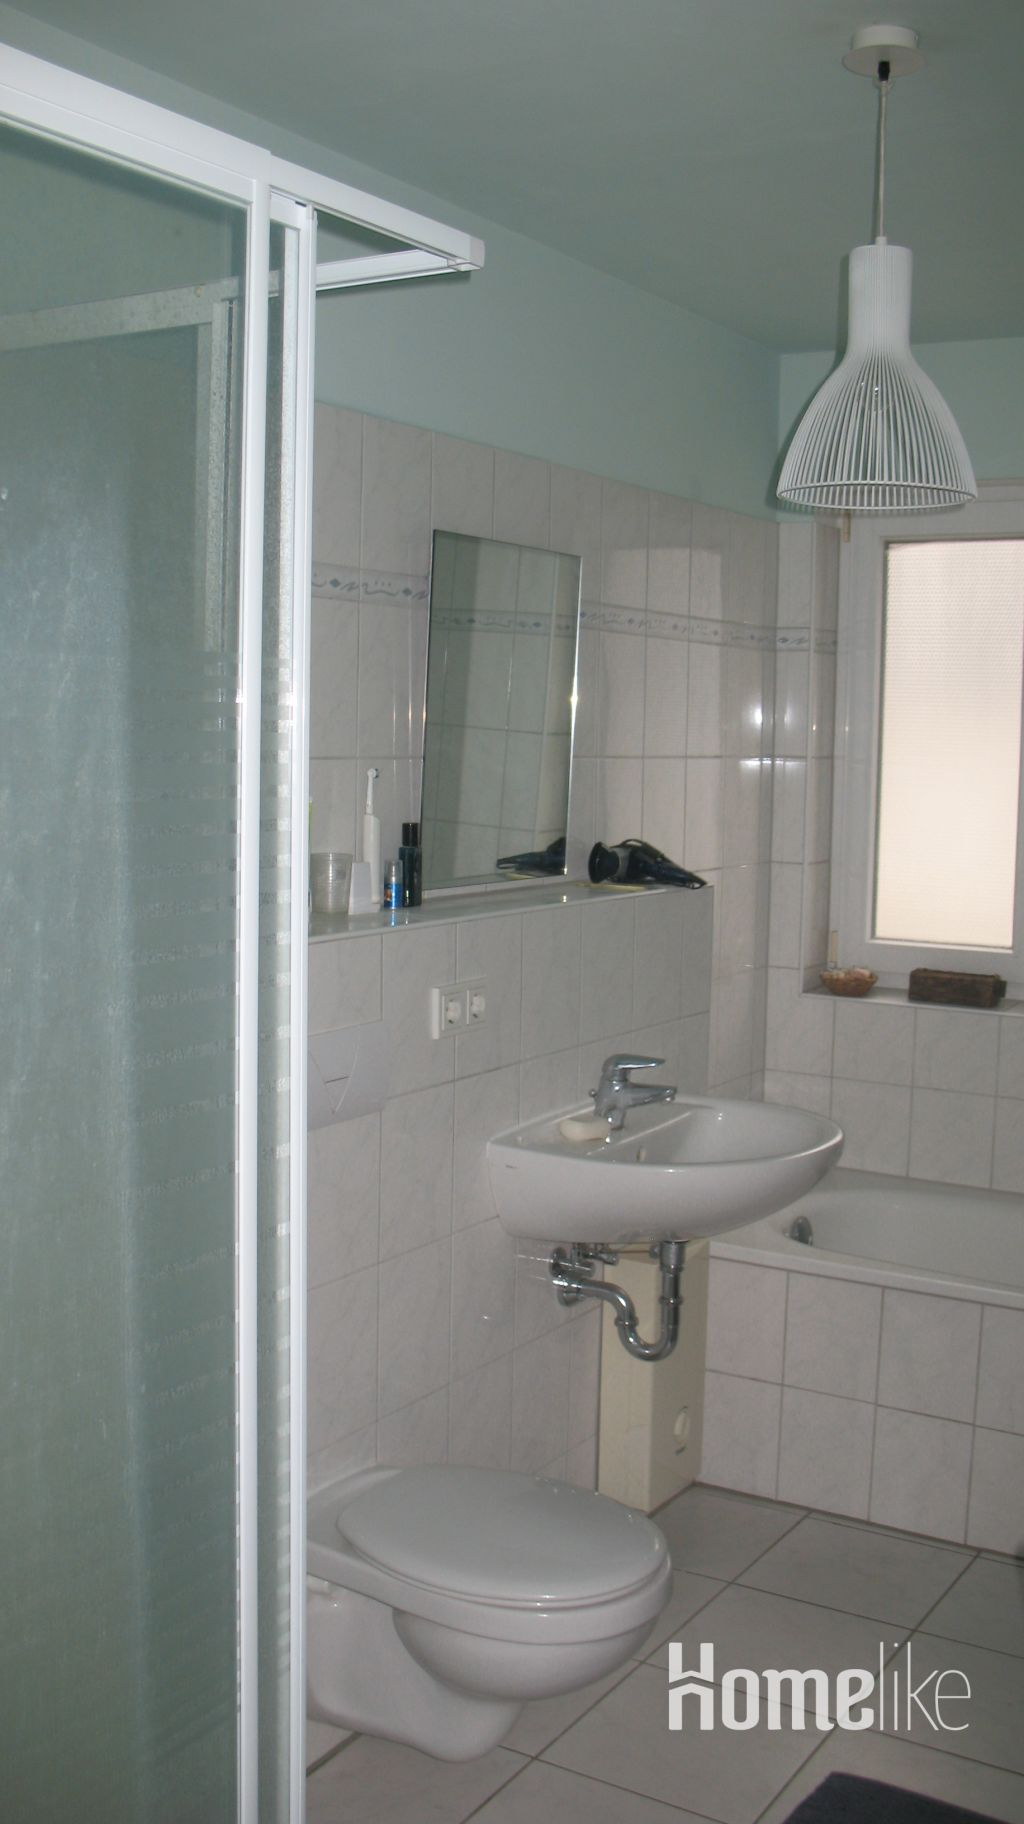 image 8 furnished 2 bedroom Apartment for rent in Bergisch Gladbach, Rheinisch-Bergischer Kreis